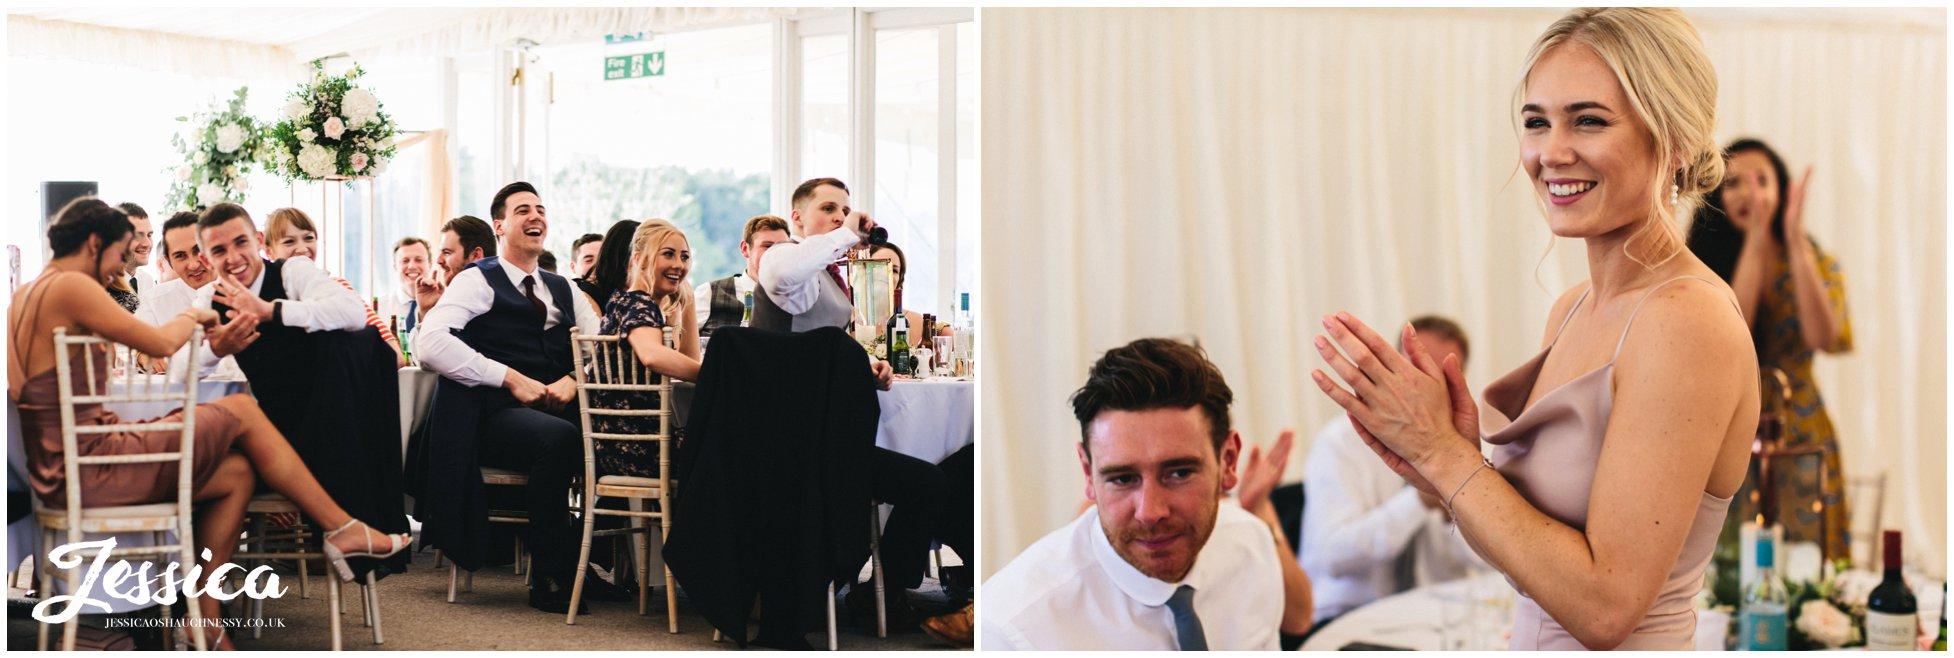 bridesmaid applauds the grooms speech at keythorpe manor